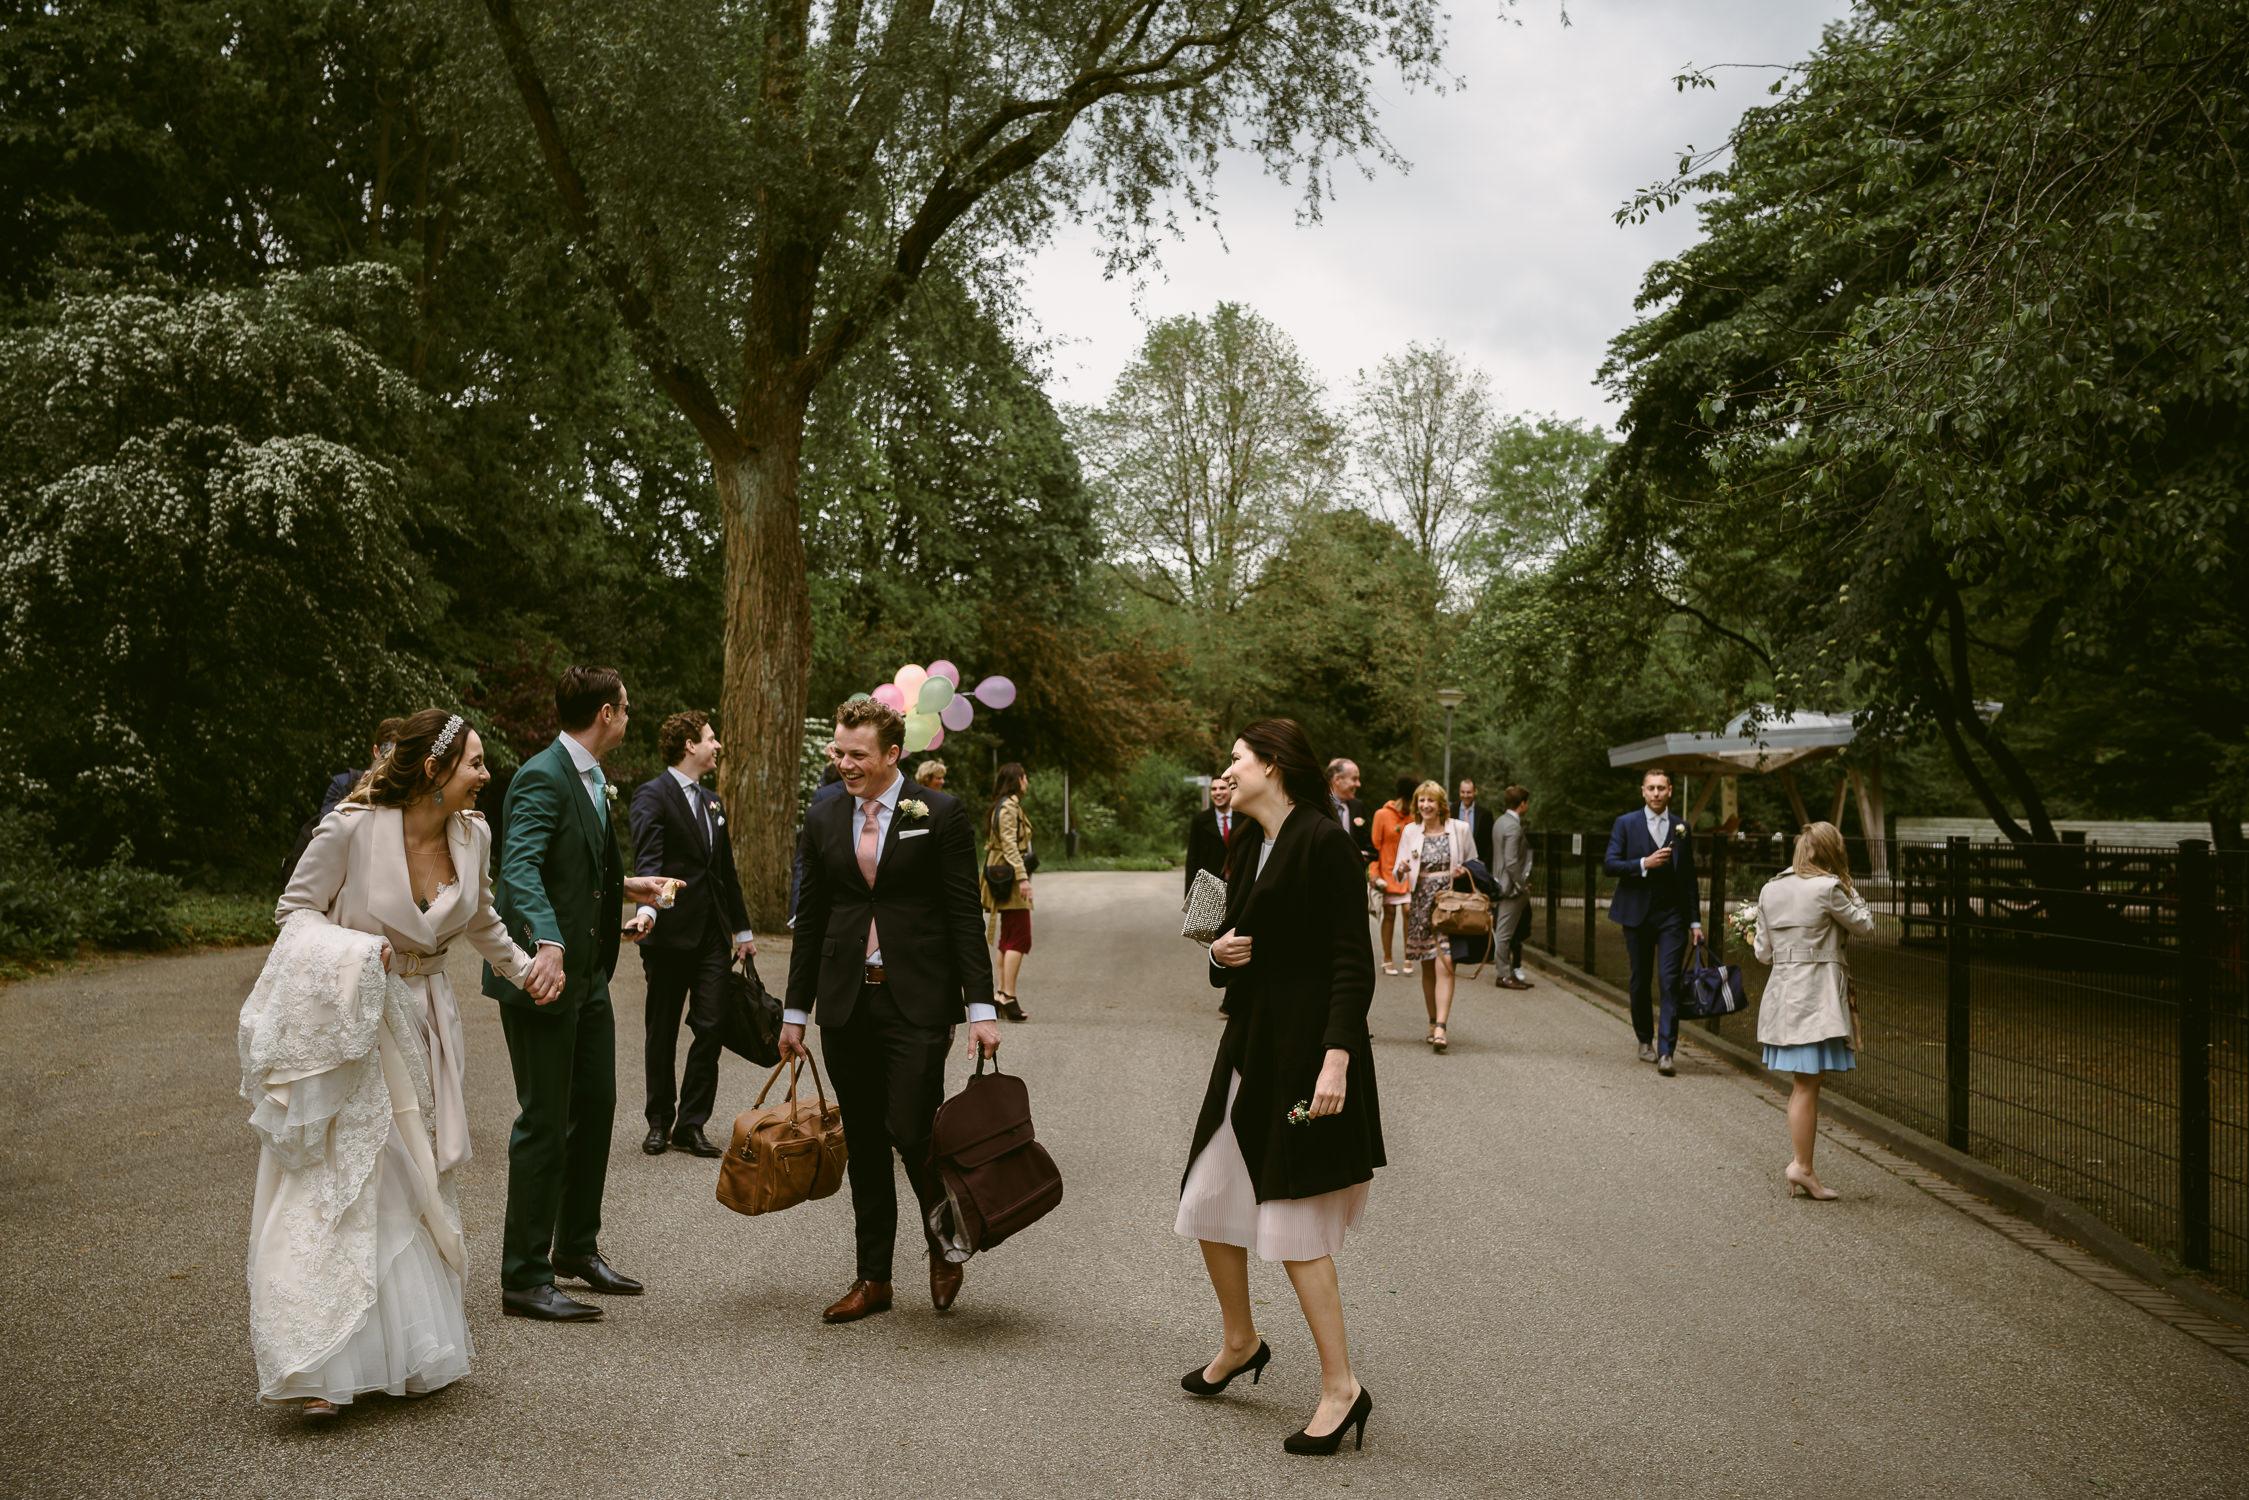 bruidsfotografie-amsterdam-utrecht-trouwfotograaf-mark-hadden-wedding-photography-Robin & Guus-128.jpg